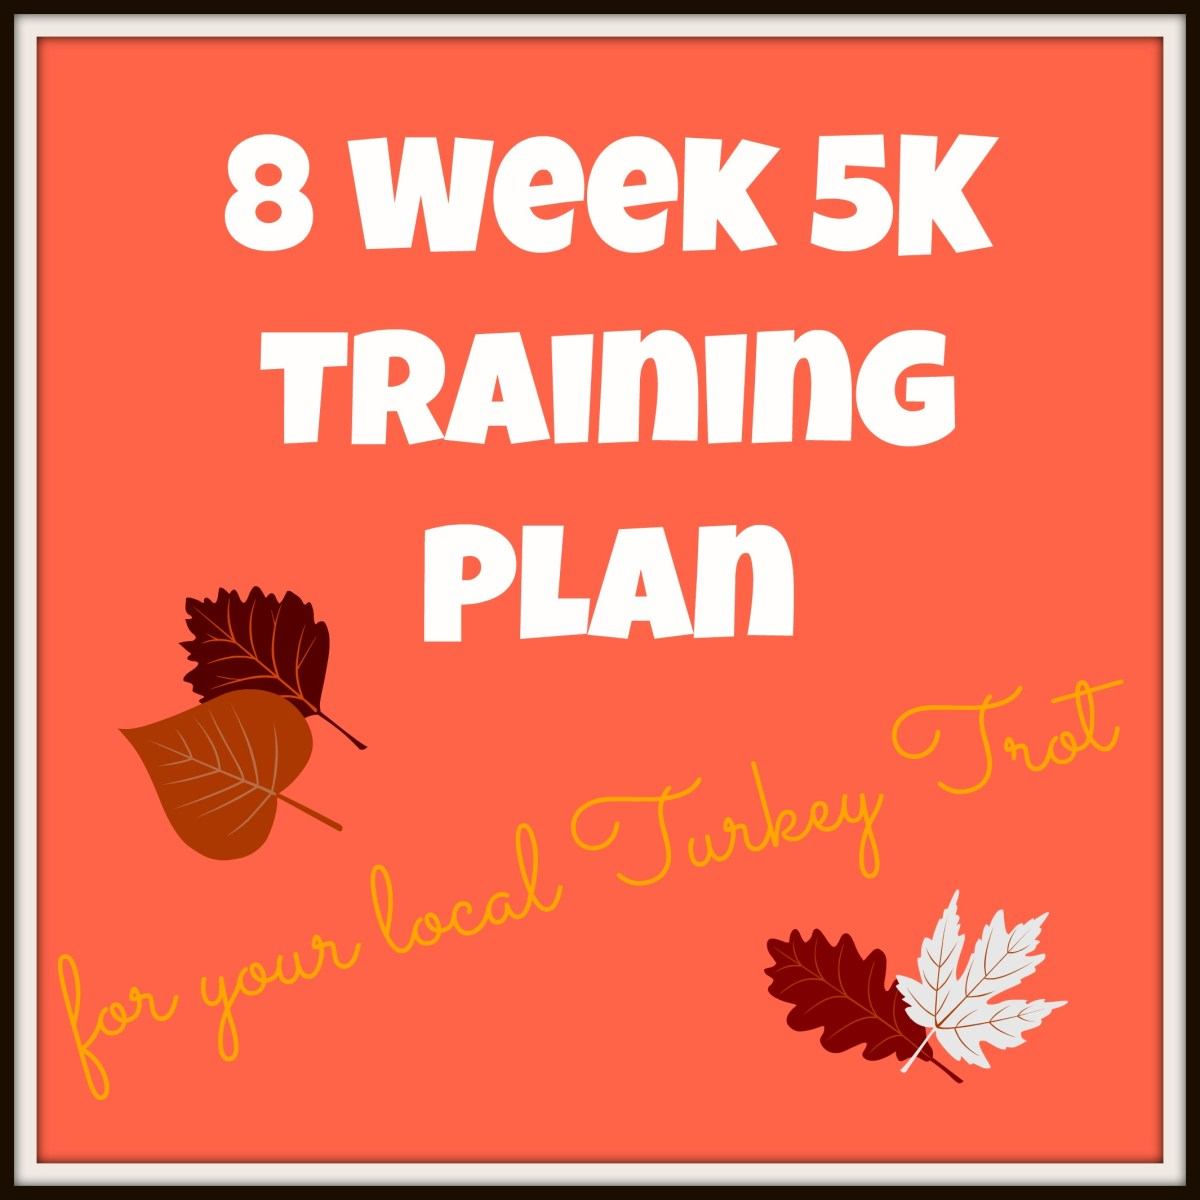 5K Training Plan for a Turkey Trot Near YOU!!